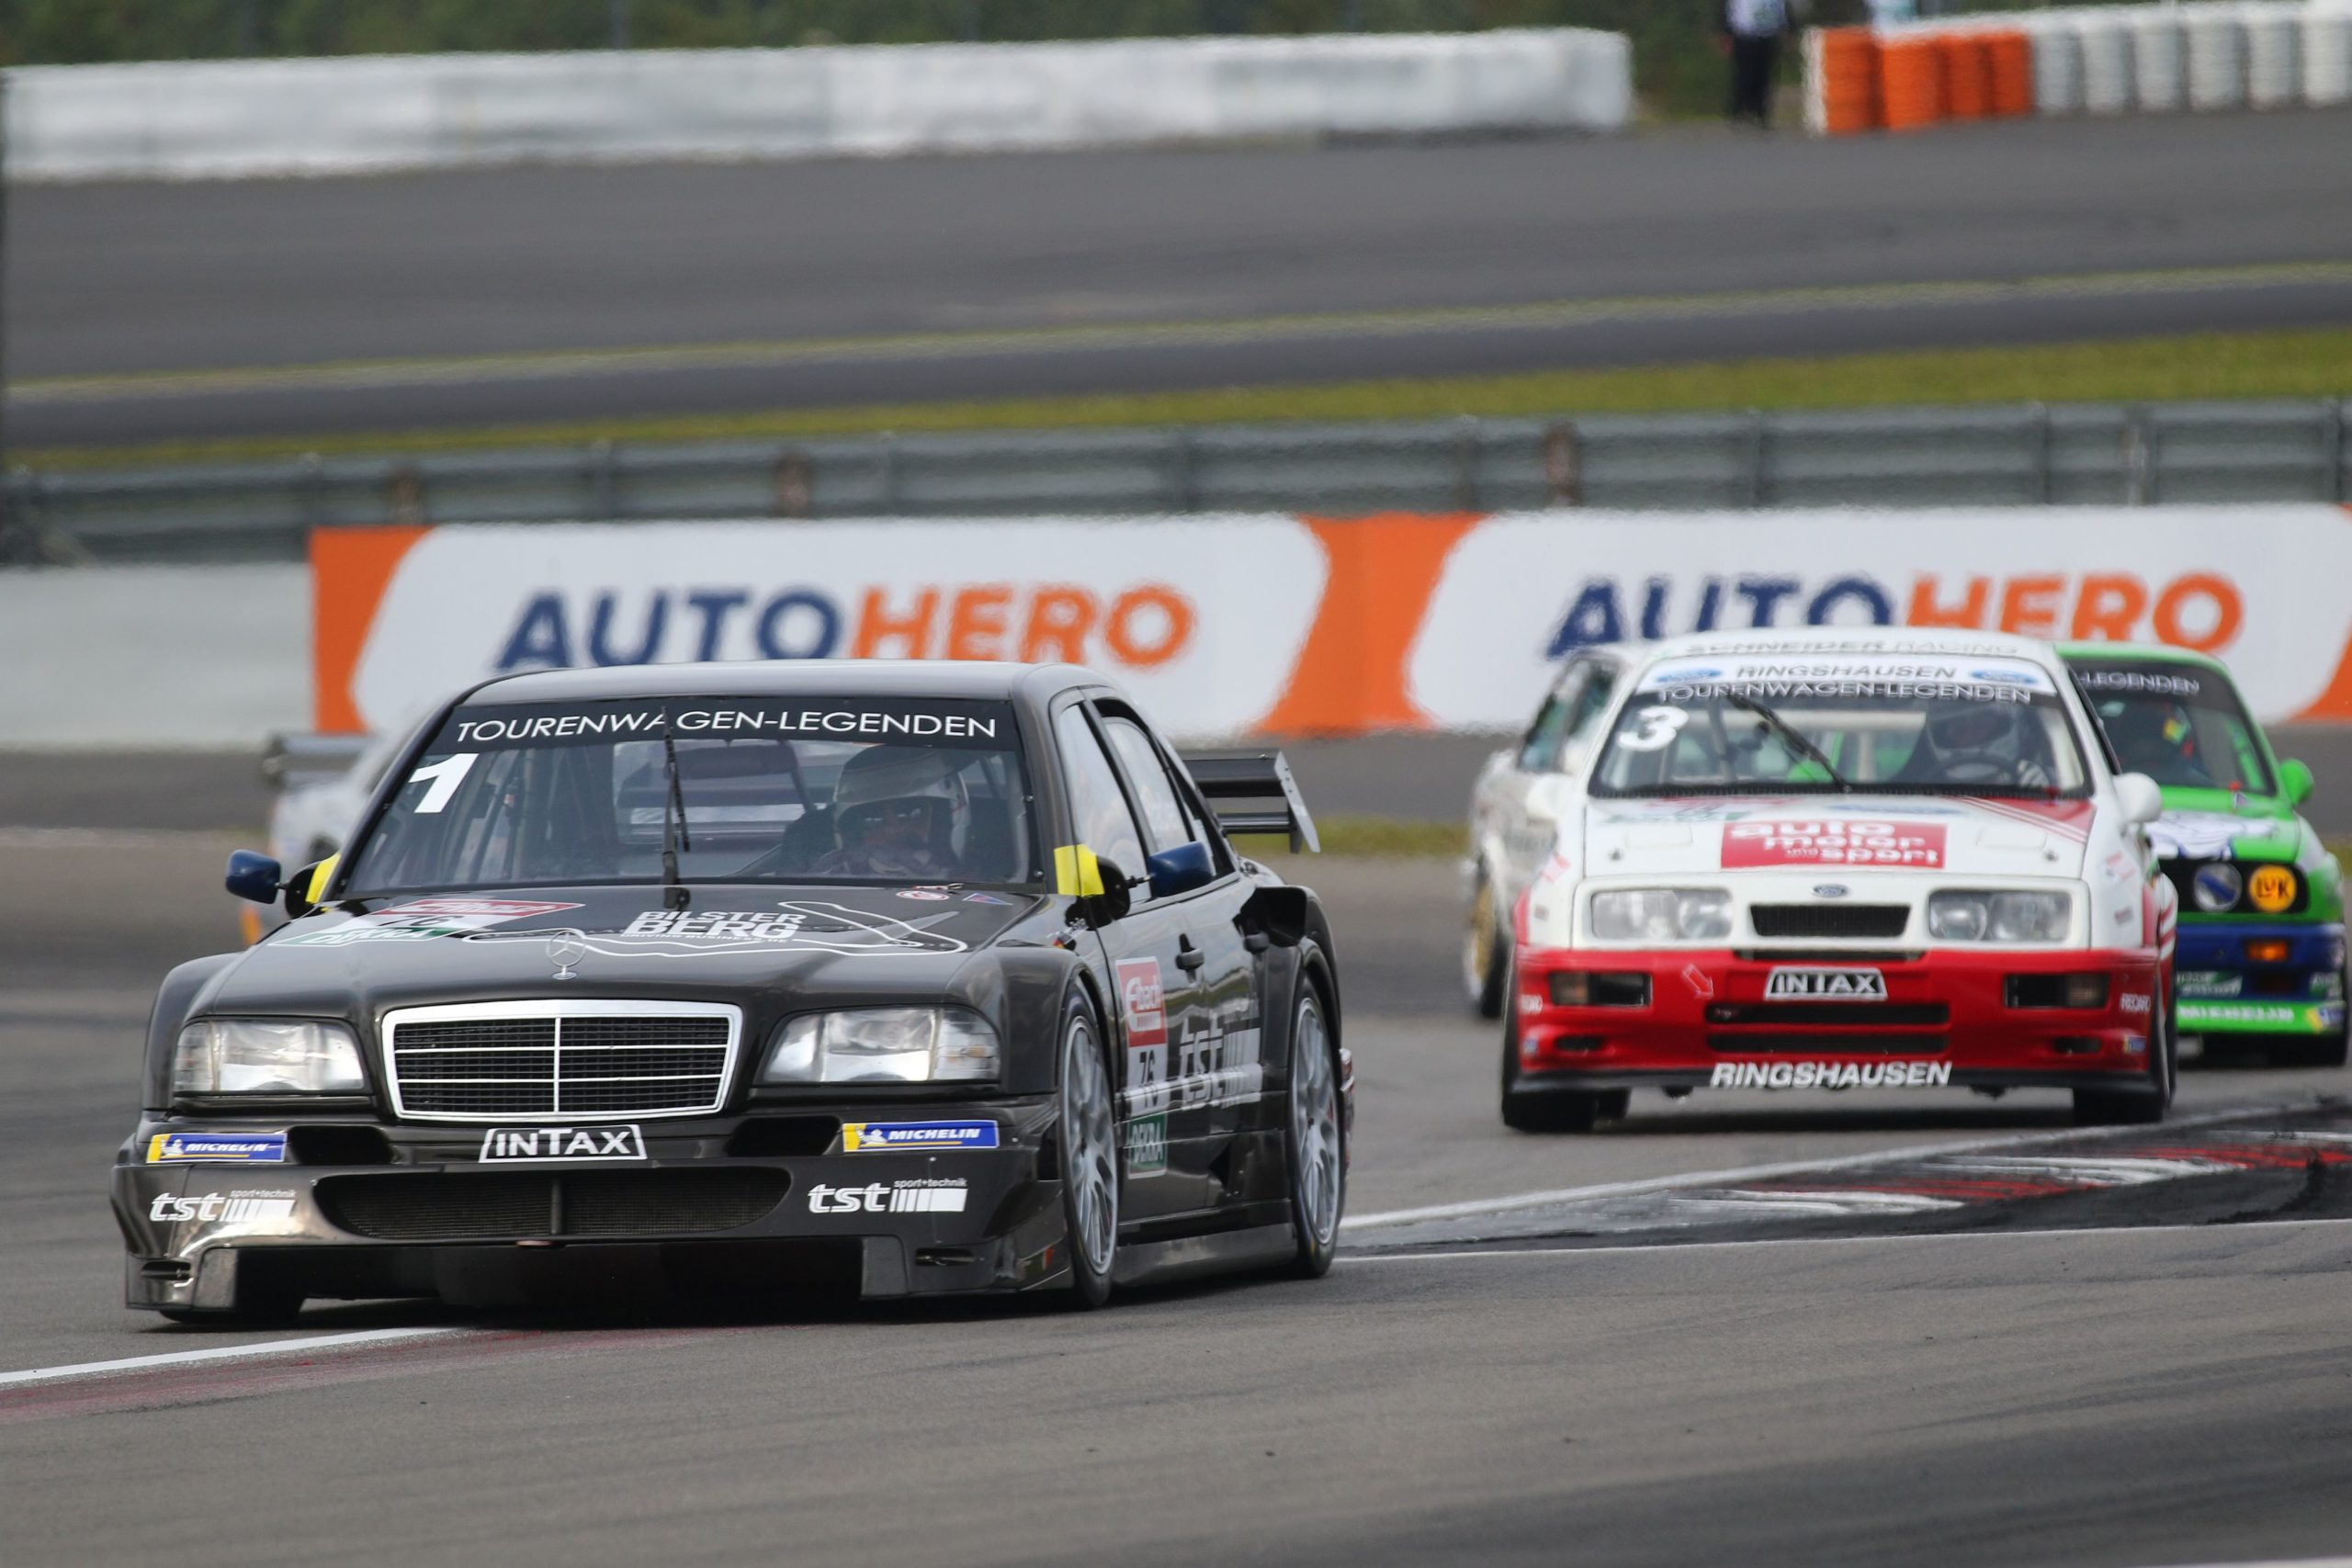 2021-DTM-Classic-Nuerburgring-tst-sport-und-technik-Mercedes-Benz-C-Klasse-Thorsten-Stadler-2116693